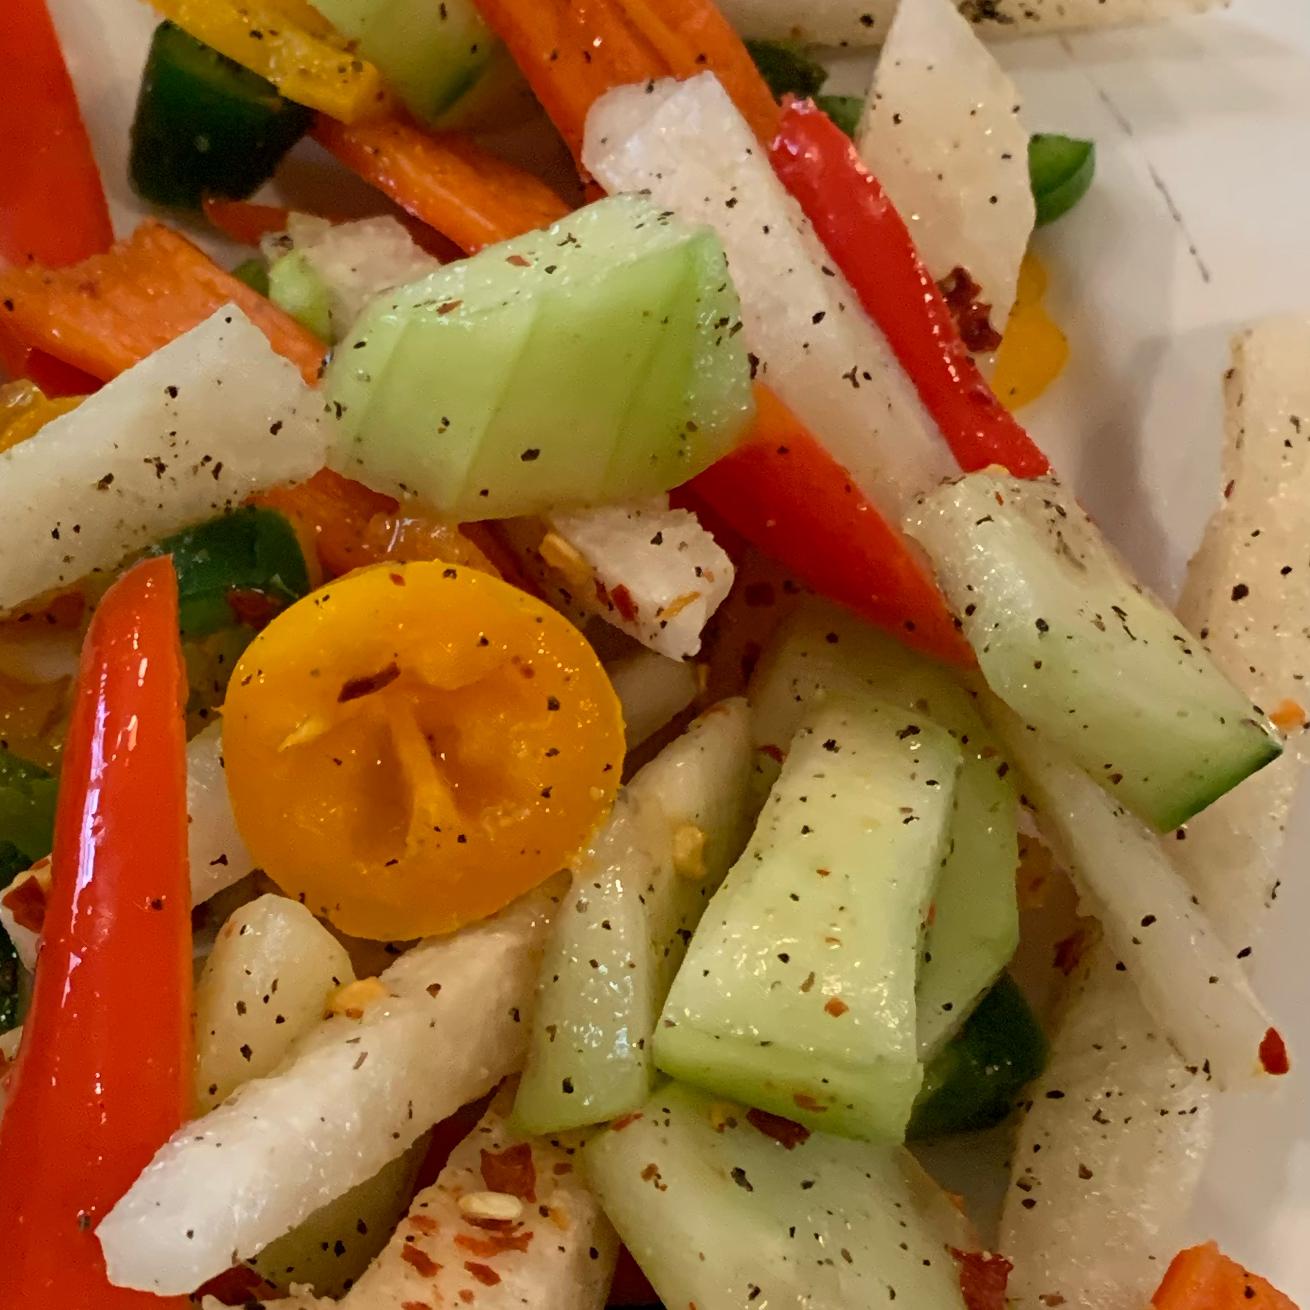 Refreshing Sweet and Spicy Jicama Salad (Vegan)